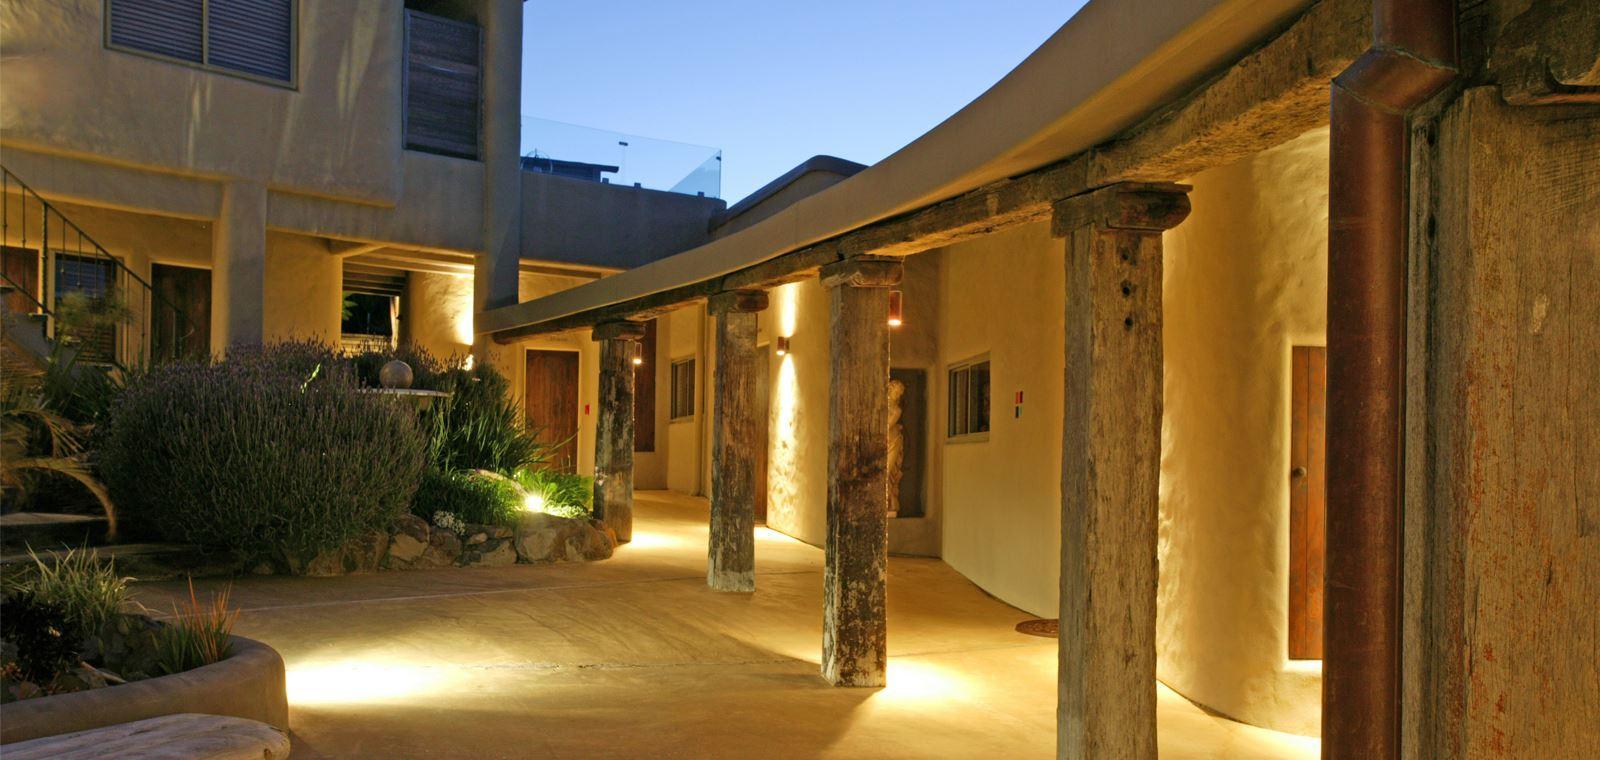 Delamore Courtyard